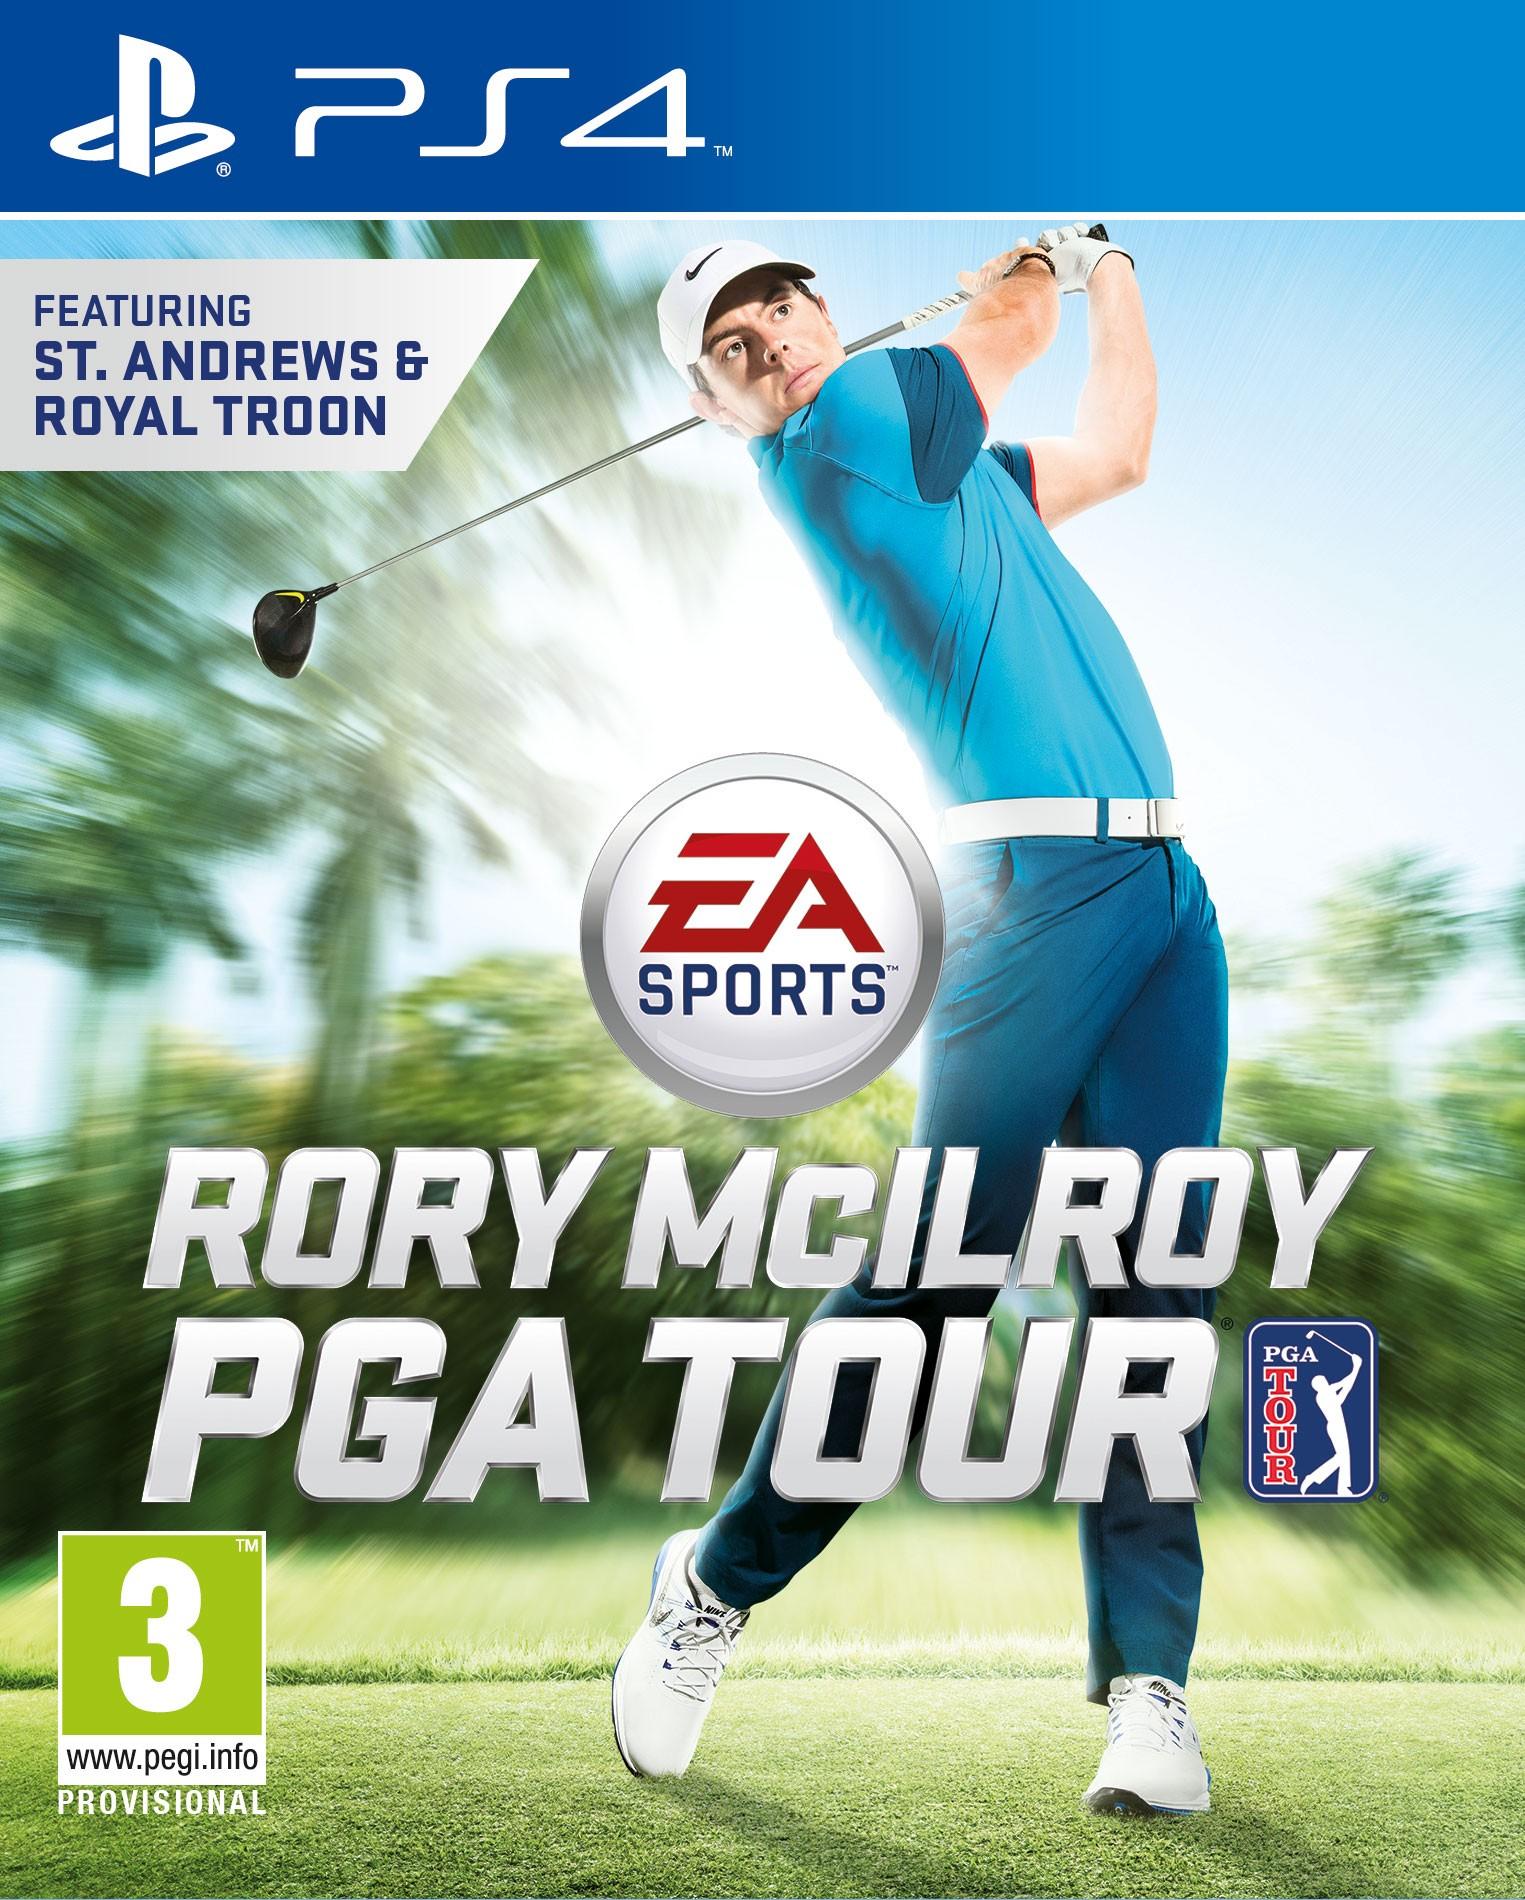 PS4RMPGA : EA Sports Rory McIlroy PGA Tour (PS4)